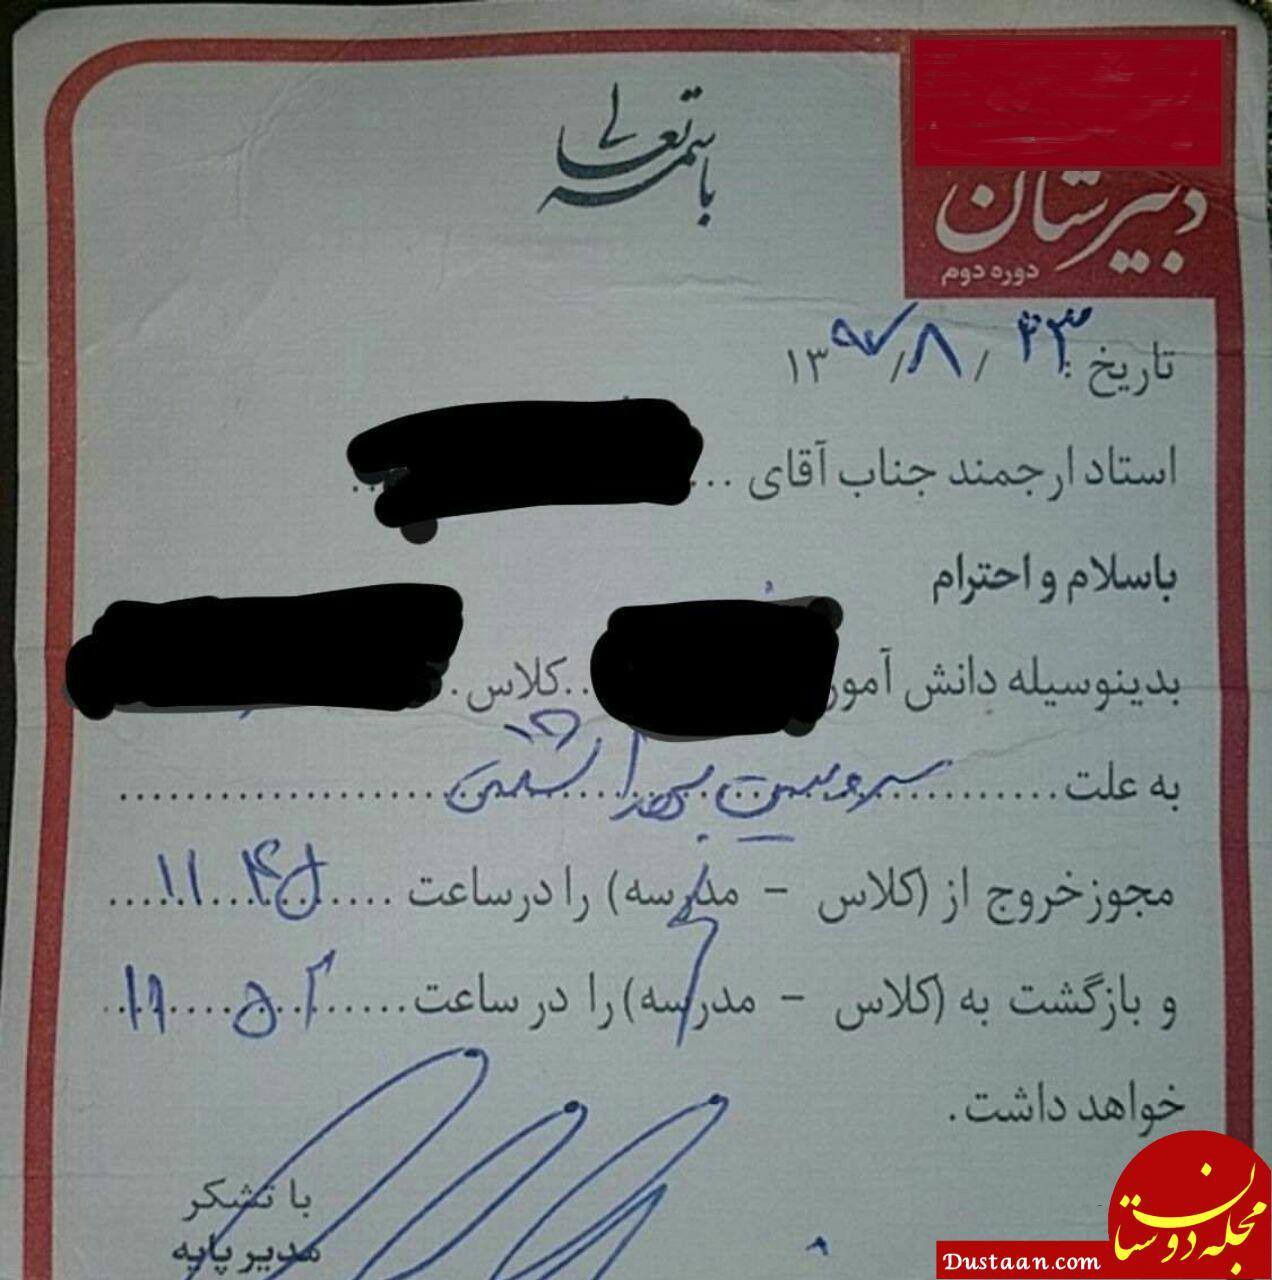 www.dustaan.com اقدام عجیب دبیرستان پسرانه در شهر مشهد! +عکس